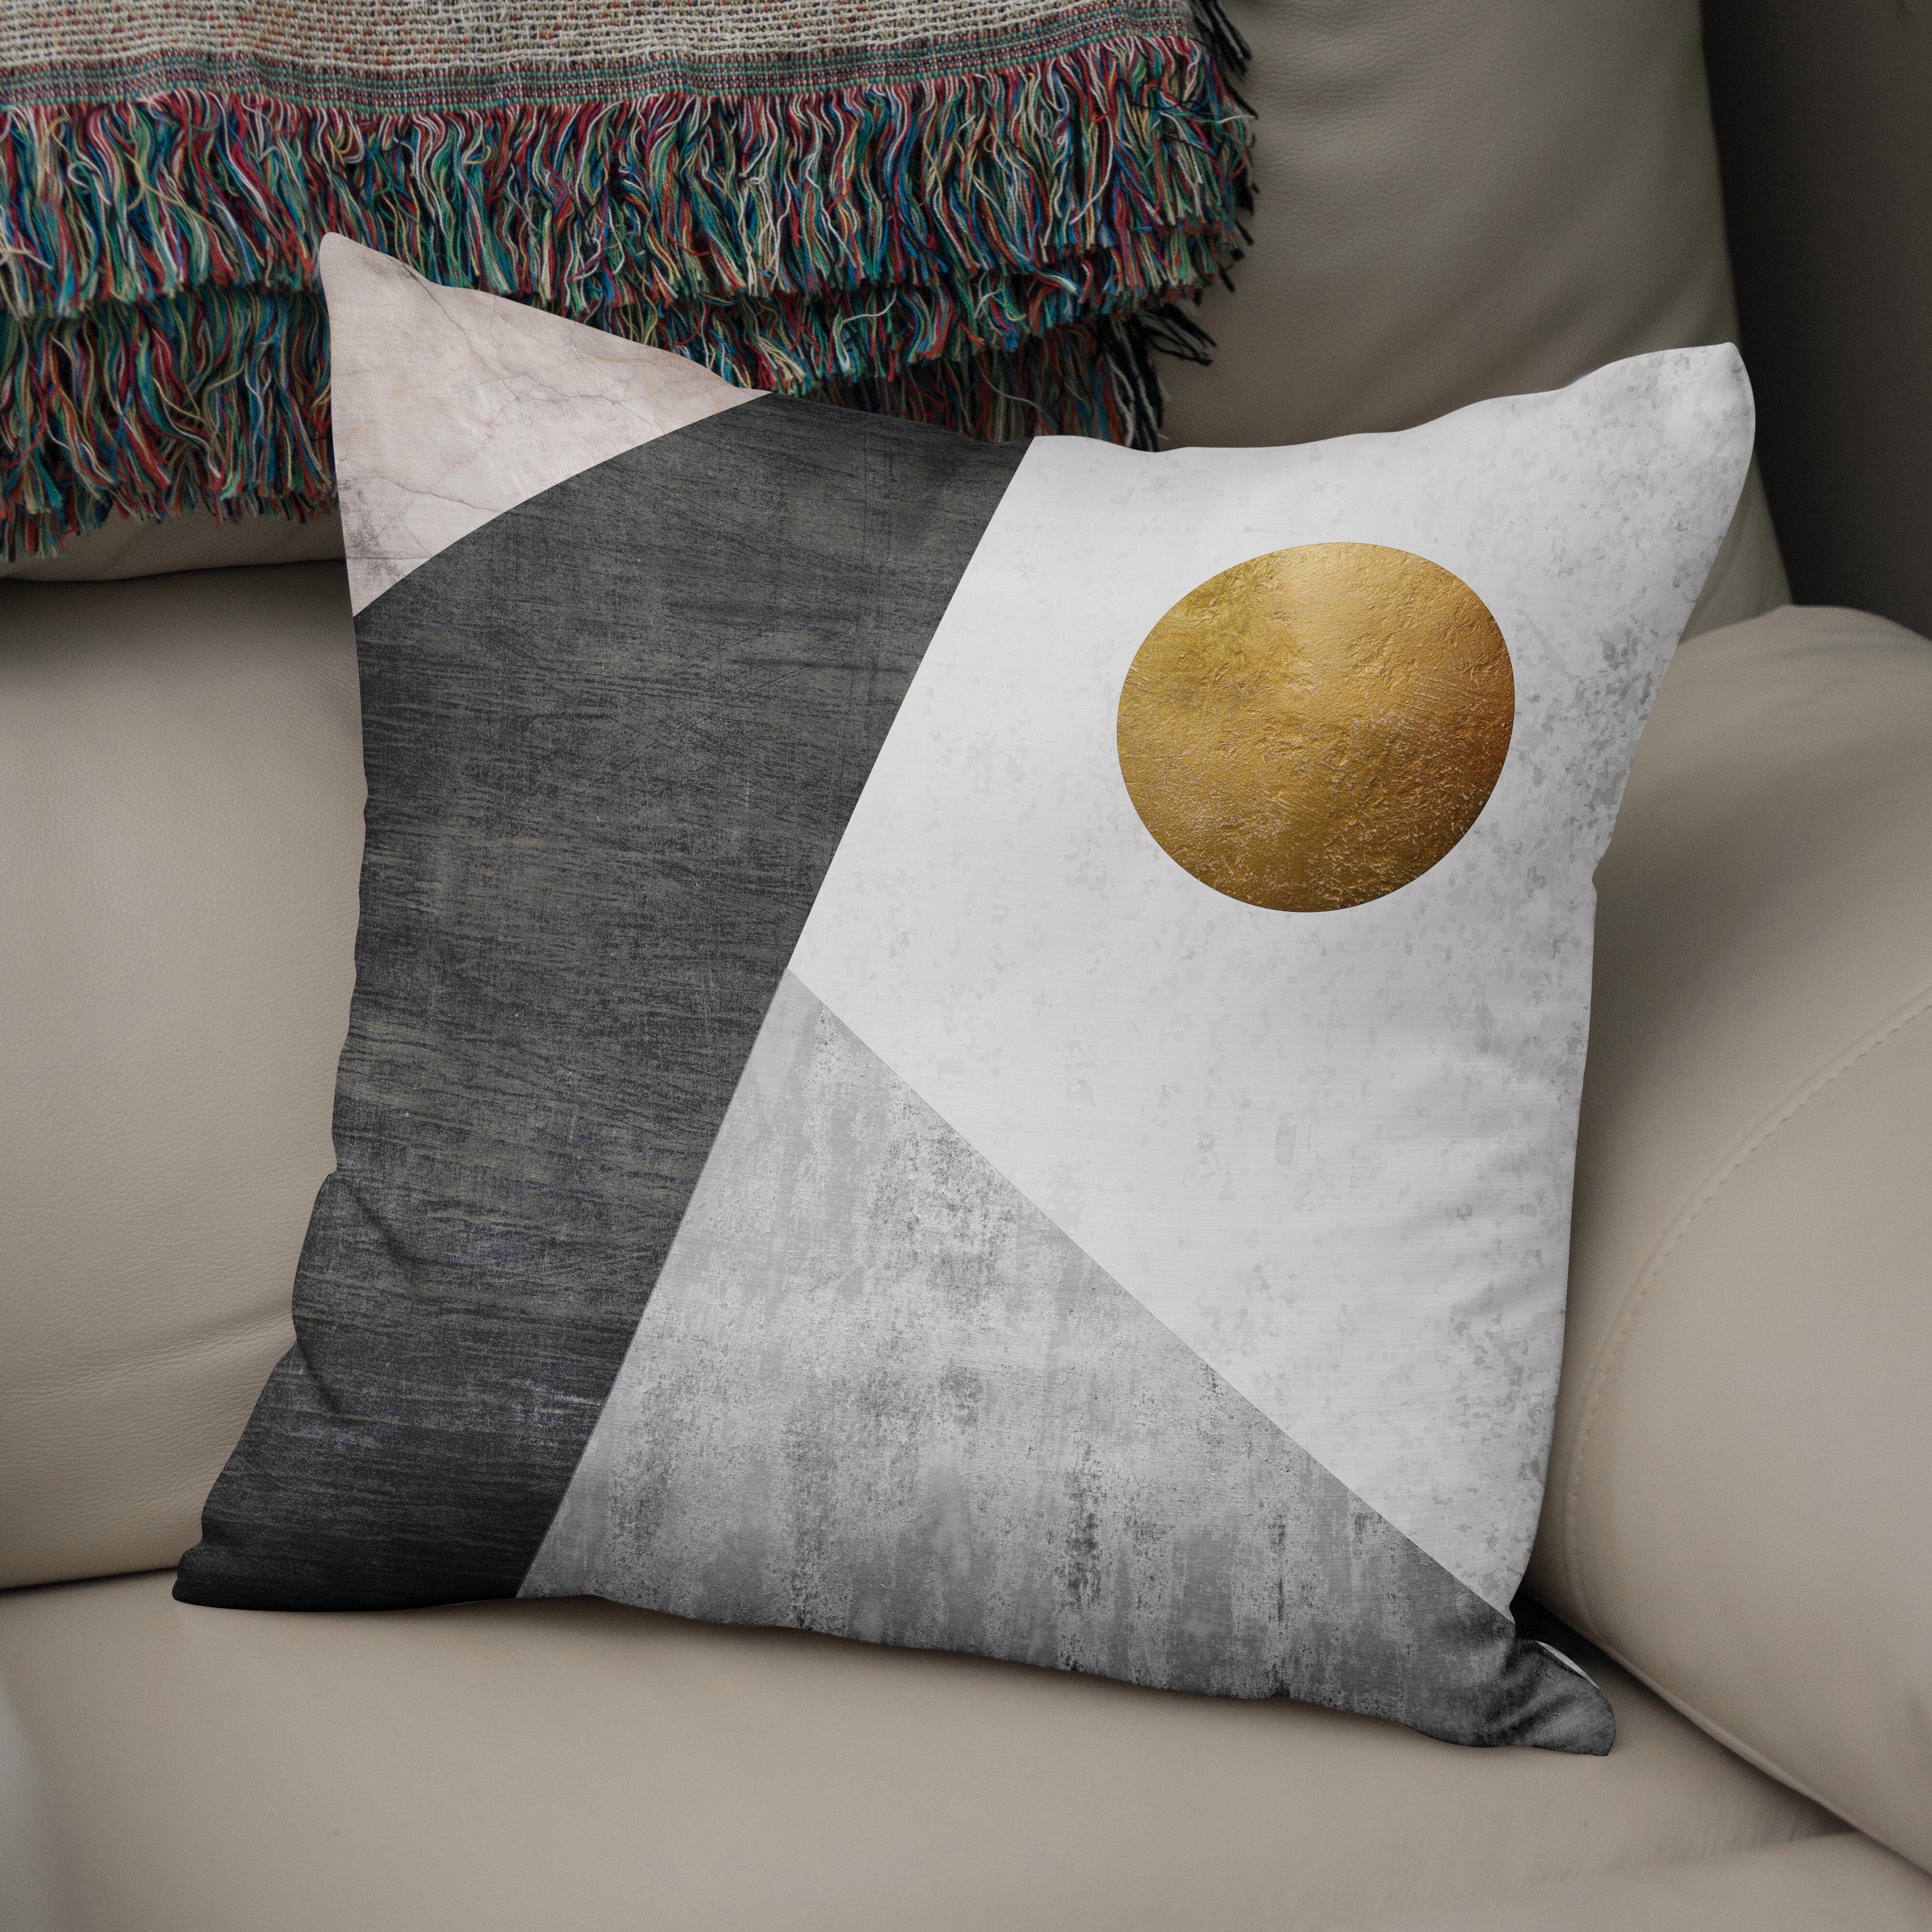 Machine Wash Mid Century Modern Throw Pillows You Ll Love In 2021 Wayfair